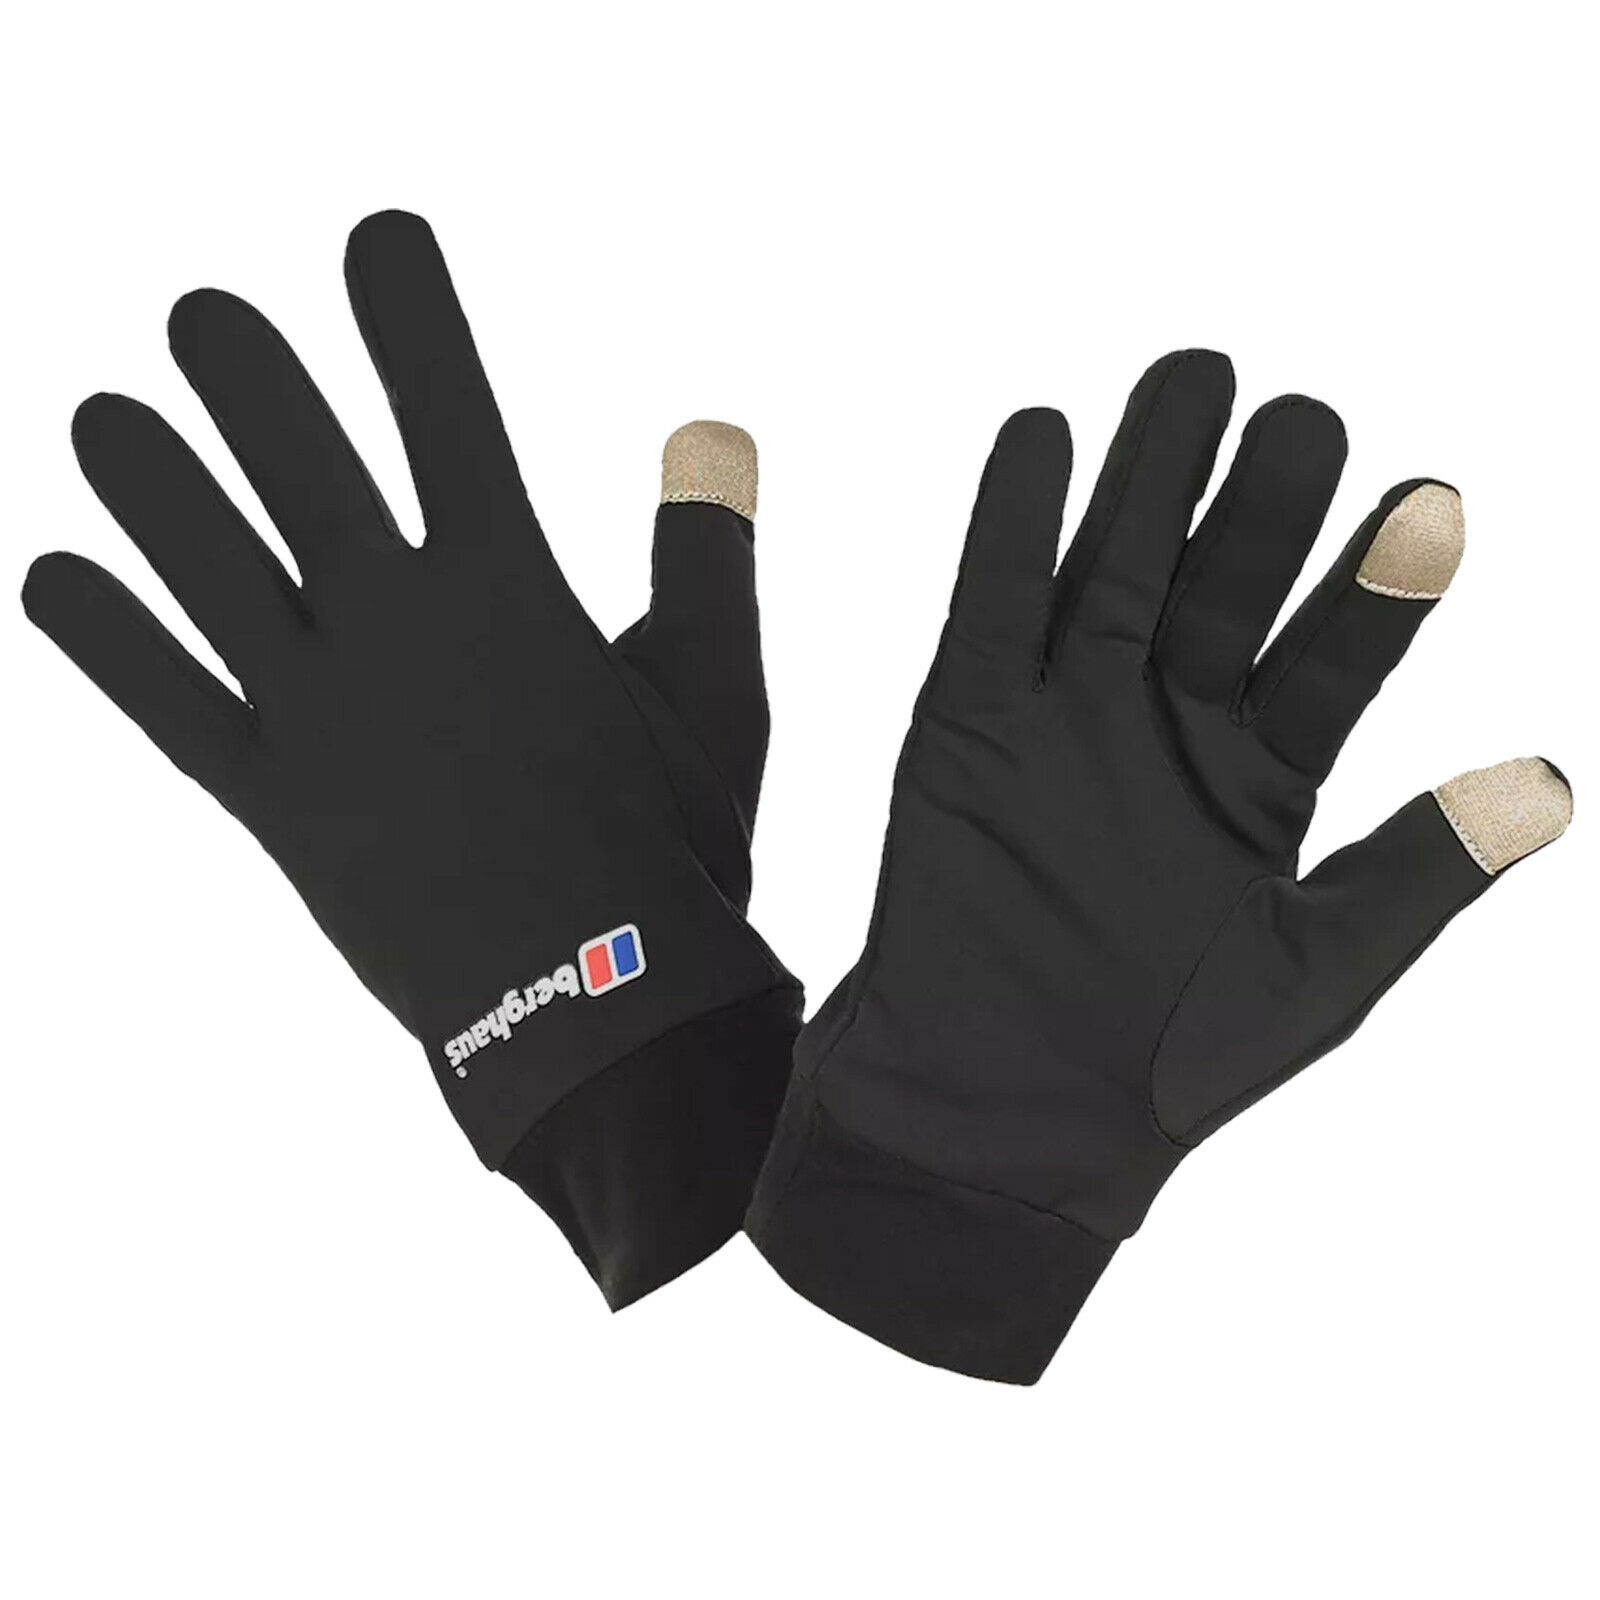 Berghaus Touch Screen Polartec Glove Liner 21055//BP6 Black NEW